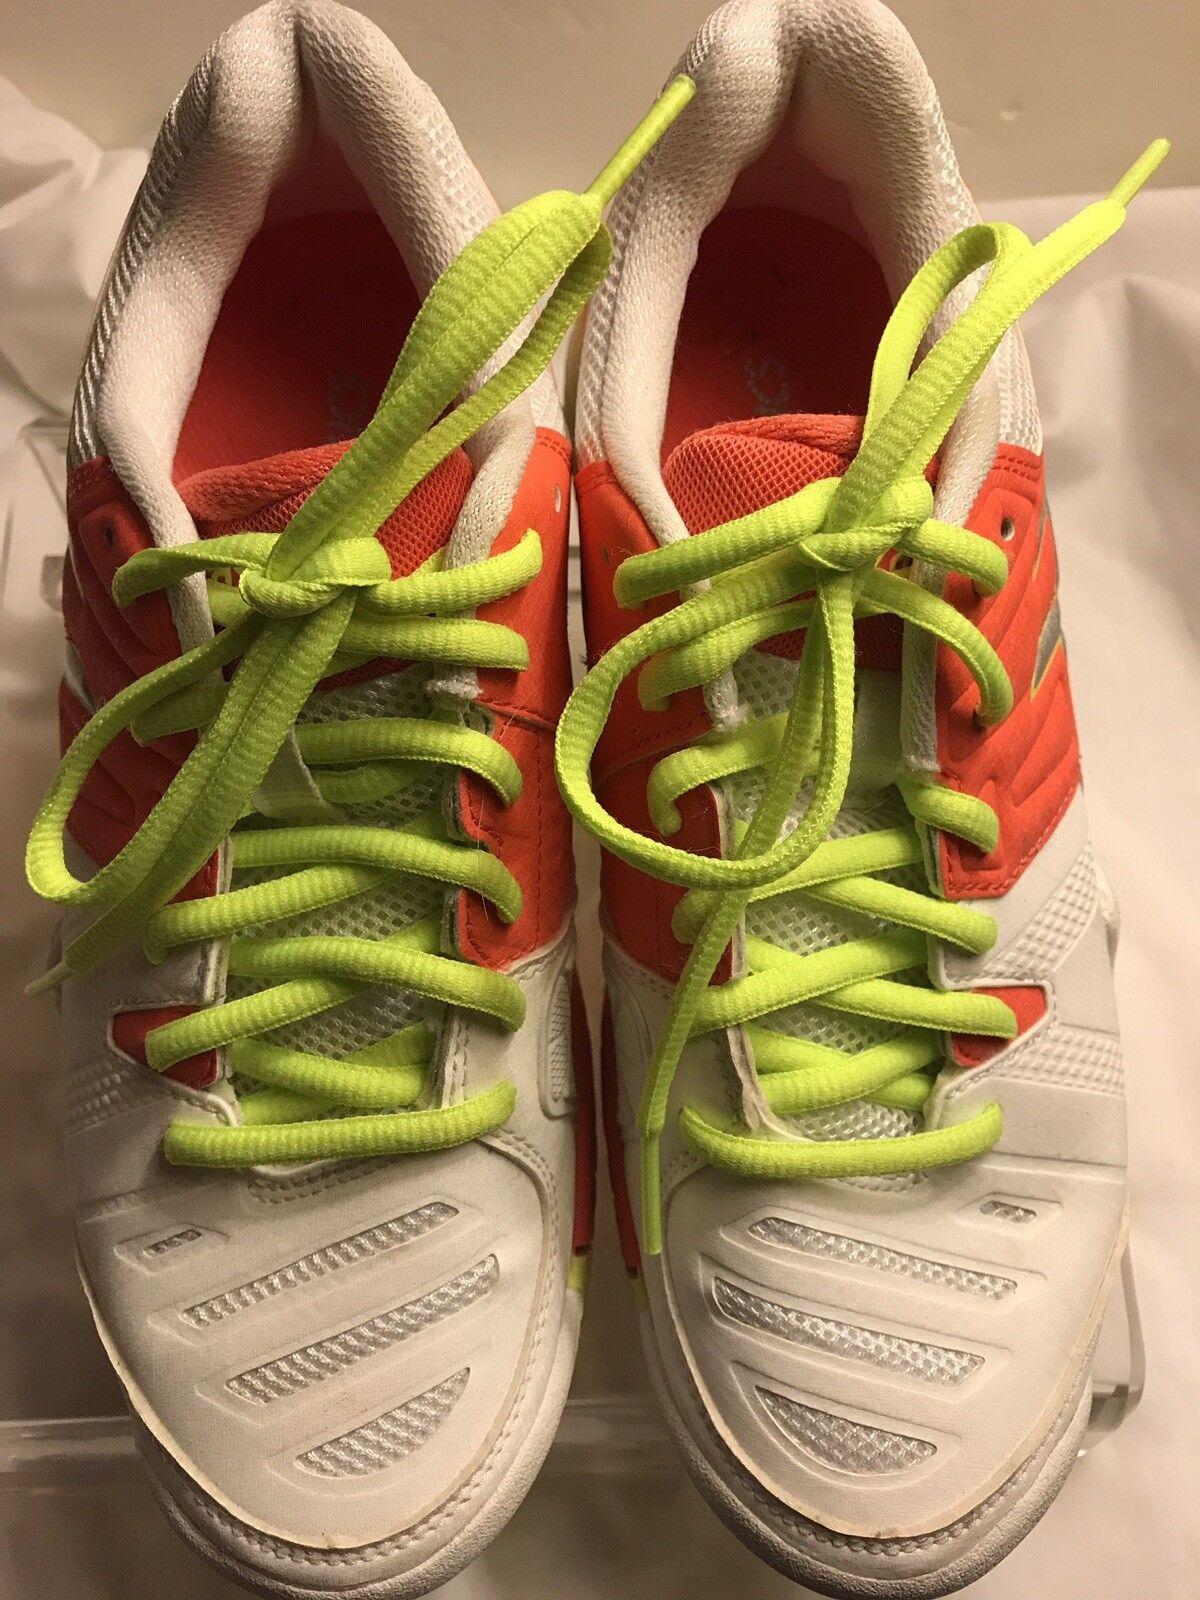 Asics Gel Challenger Tennis Court shoes Women White orange Size 5.5